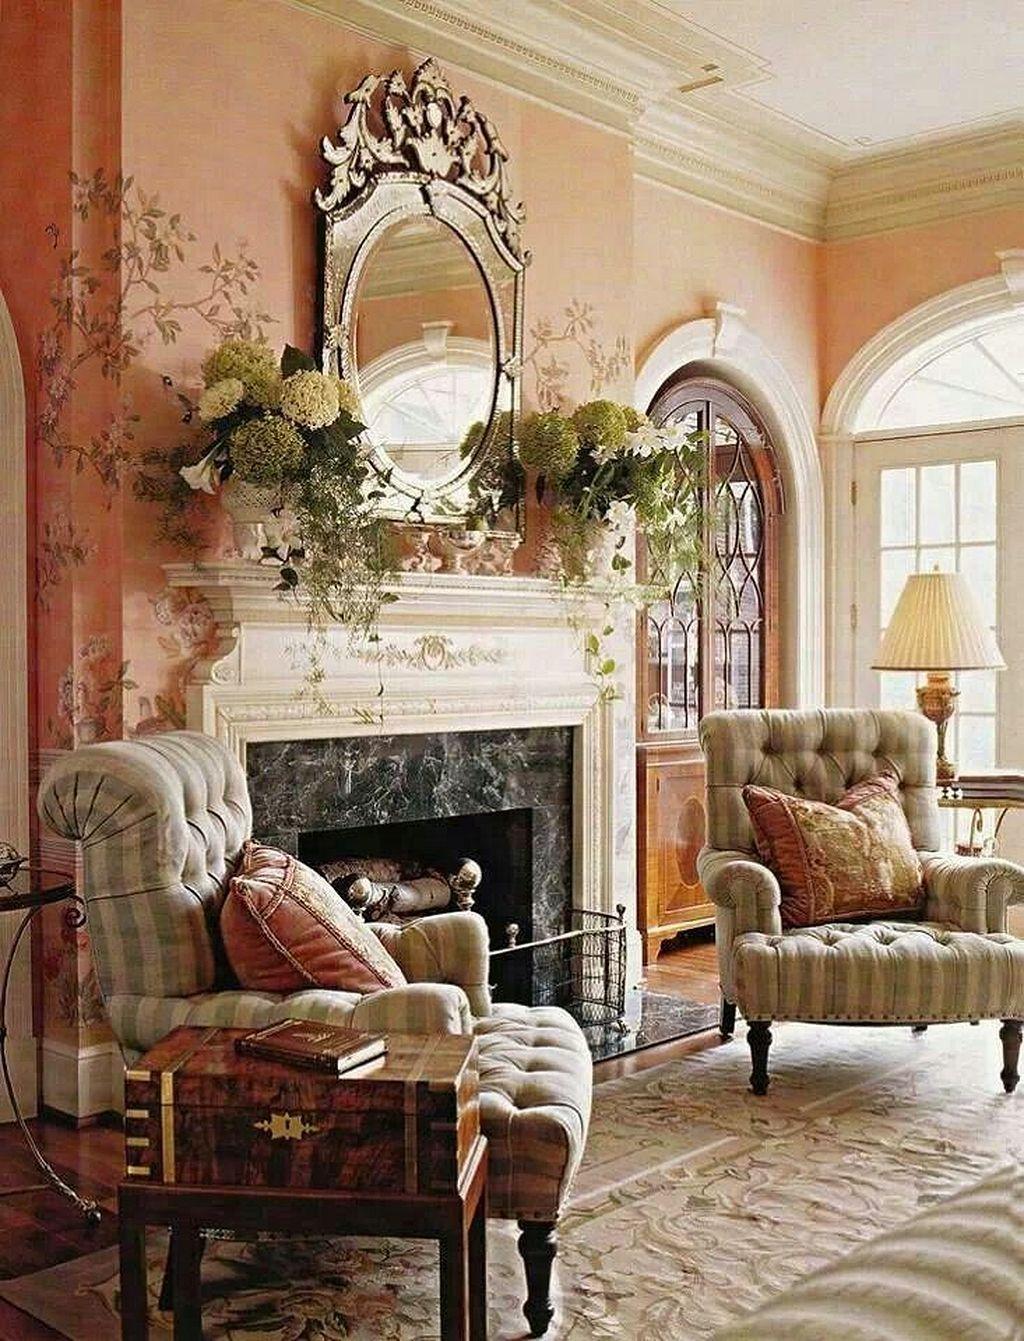 80 English Country Home Decor Ideas 80